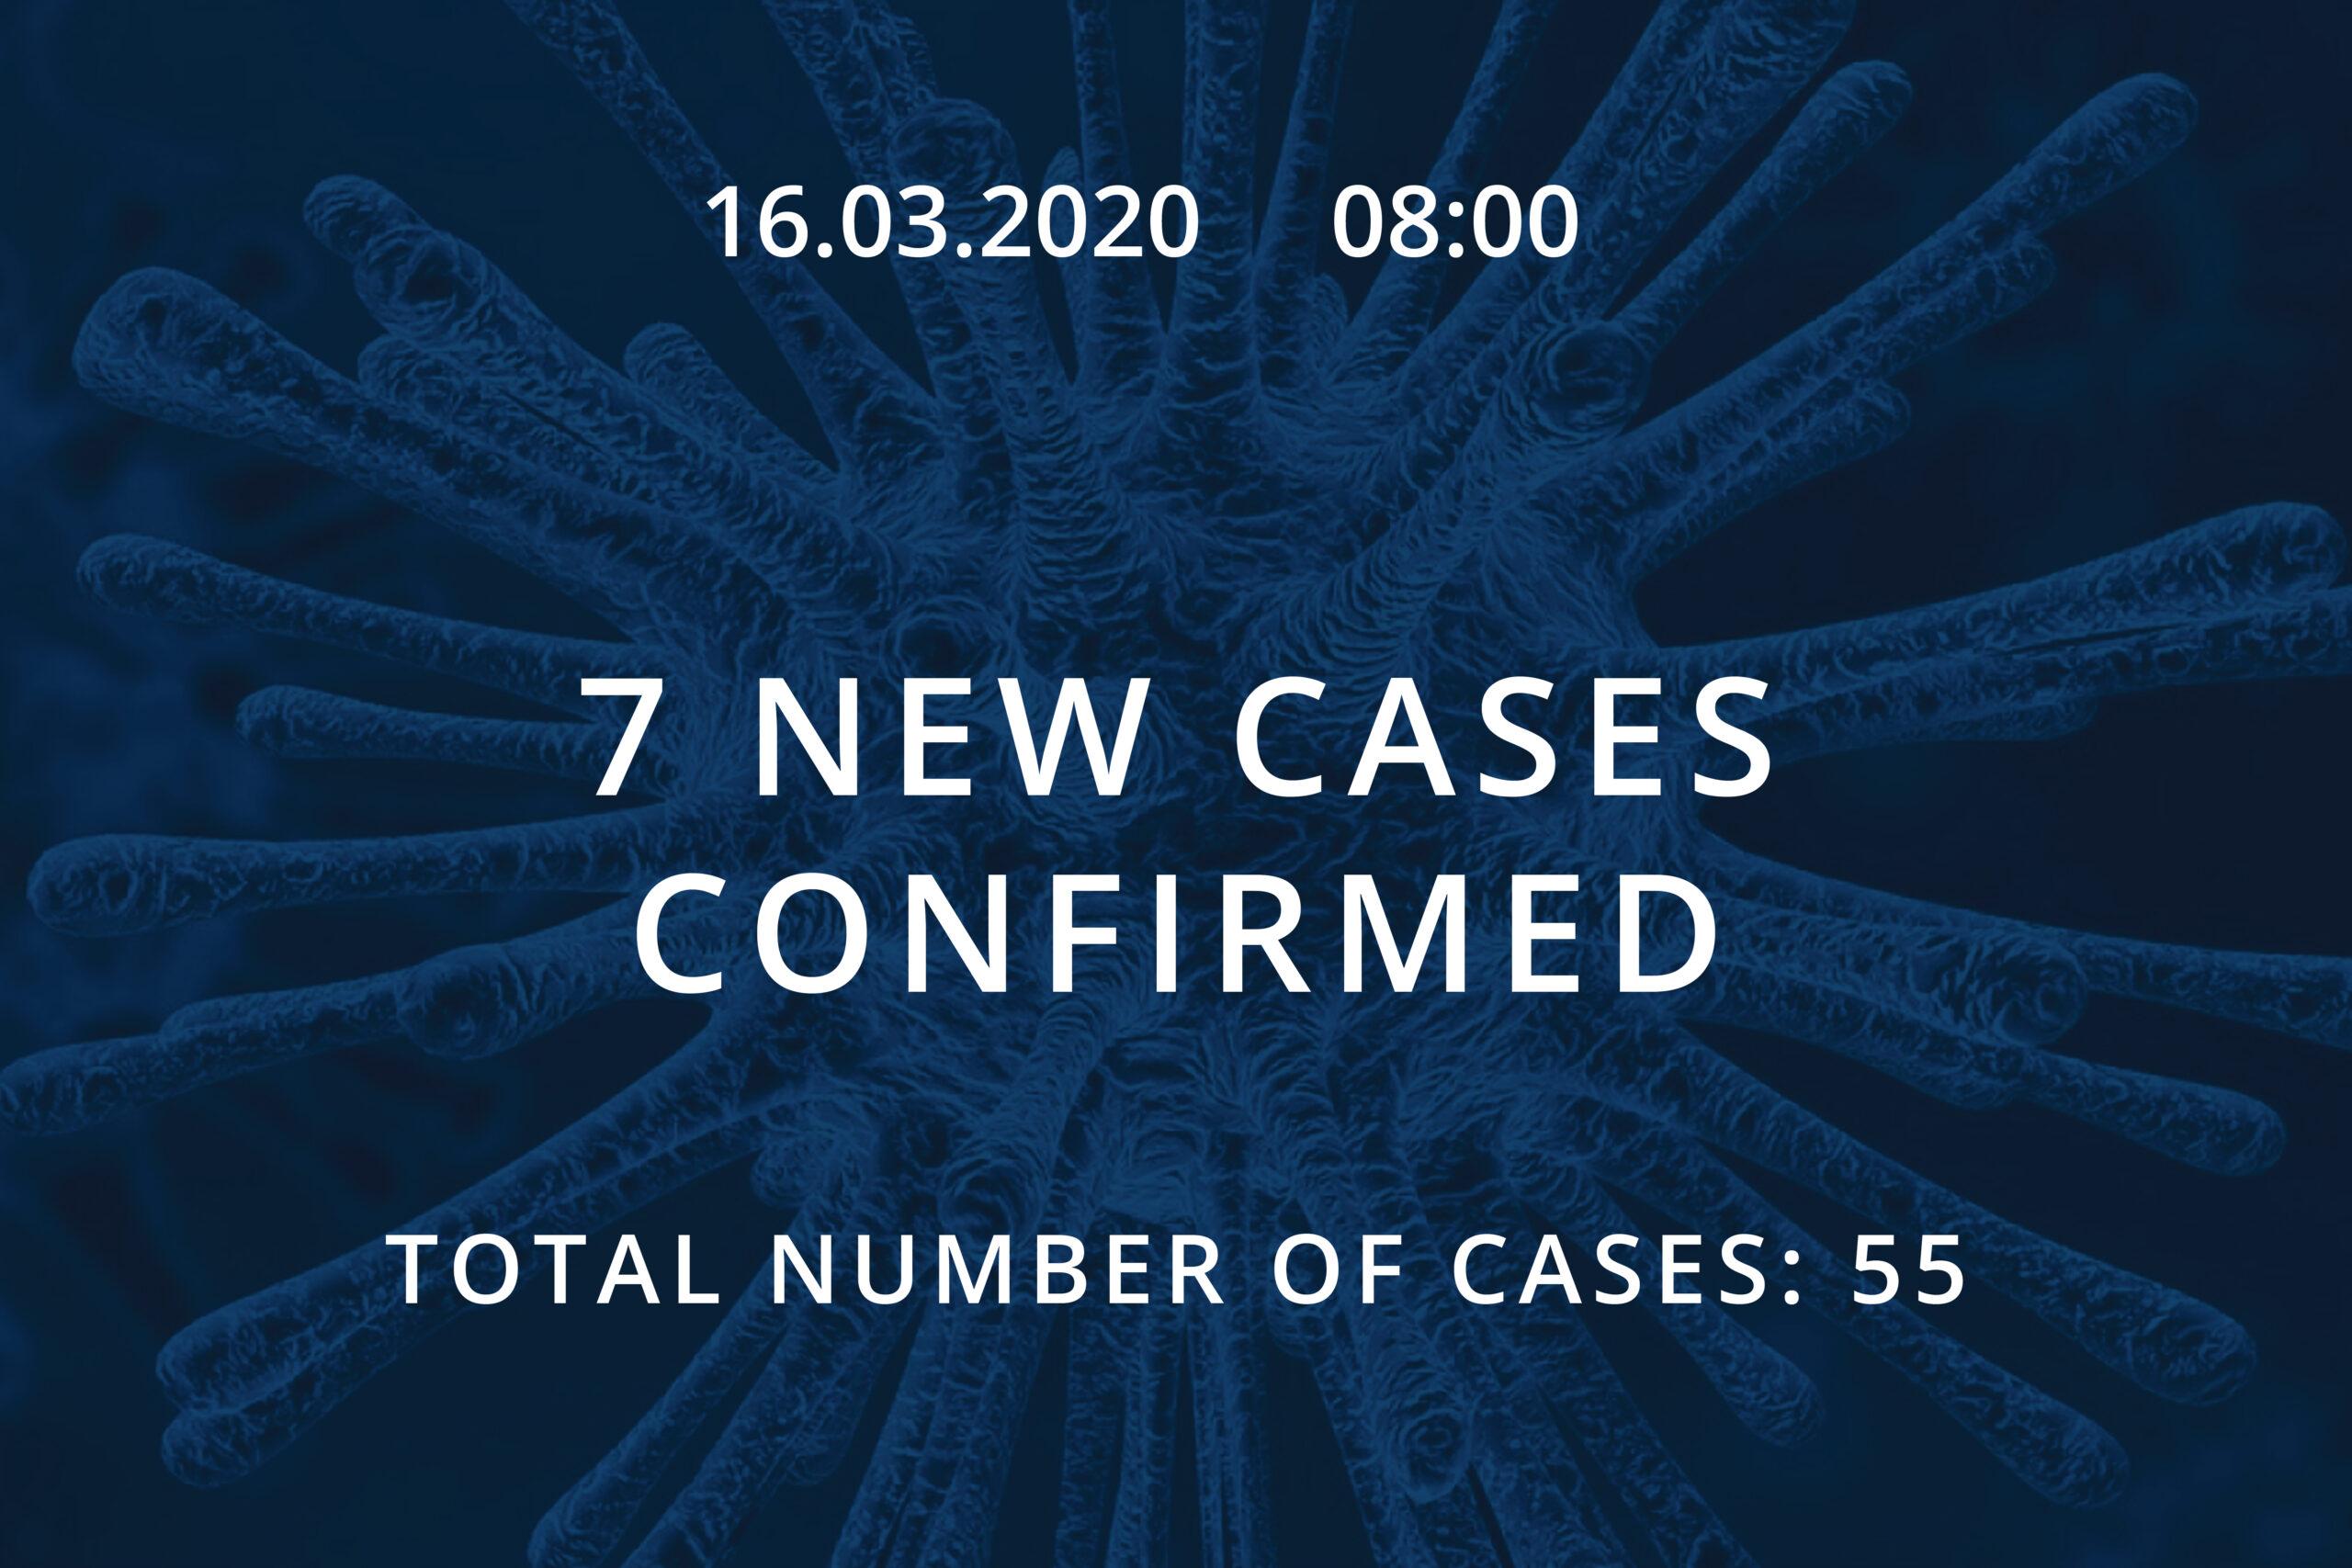 Information about coronavirus COVID-19, 16.03.2020 at 08:00